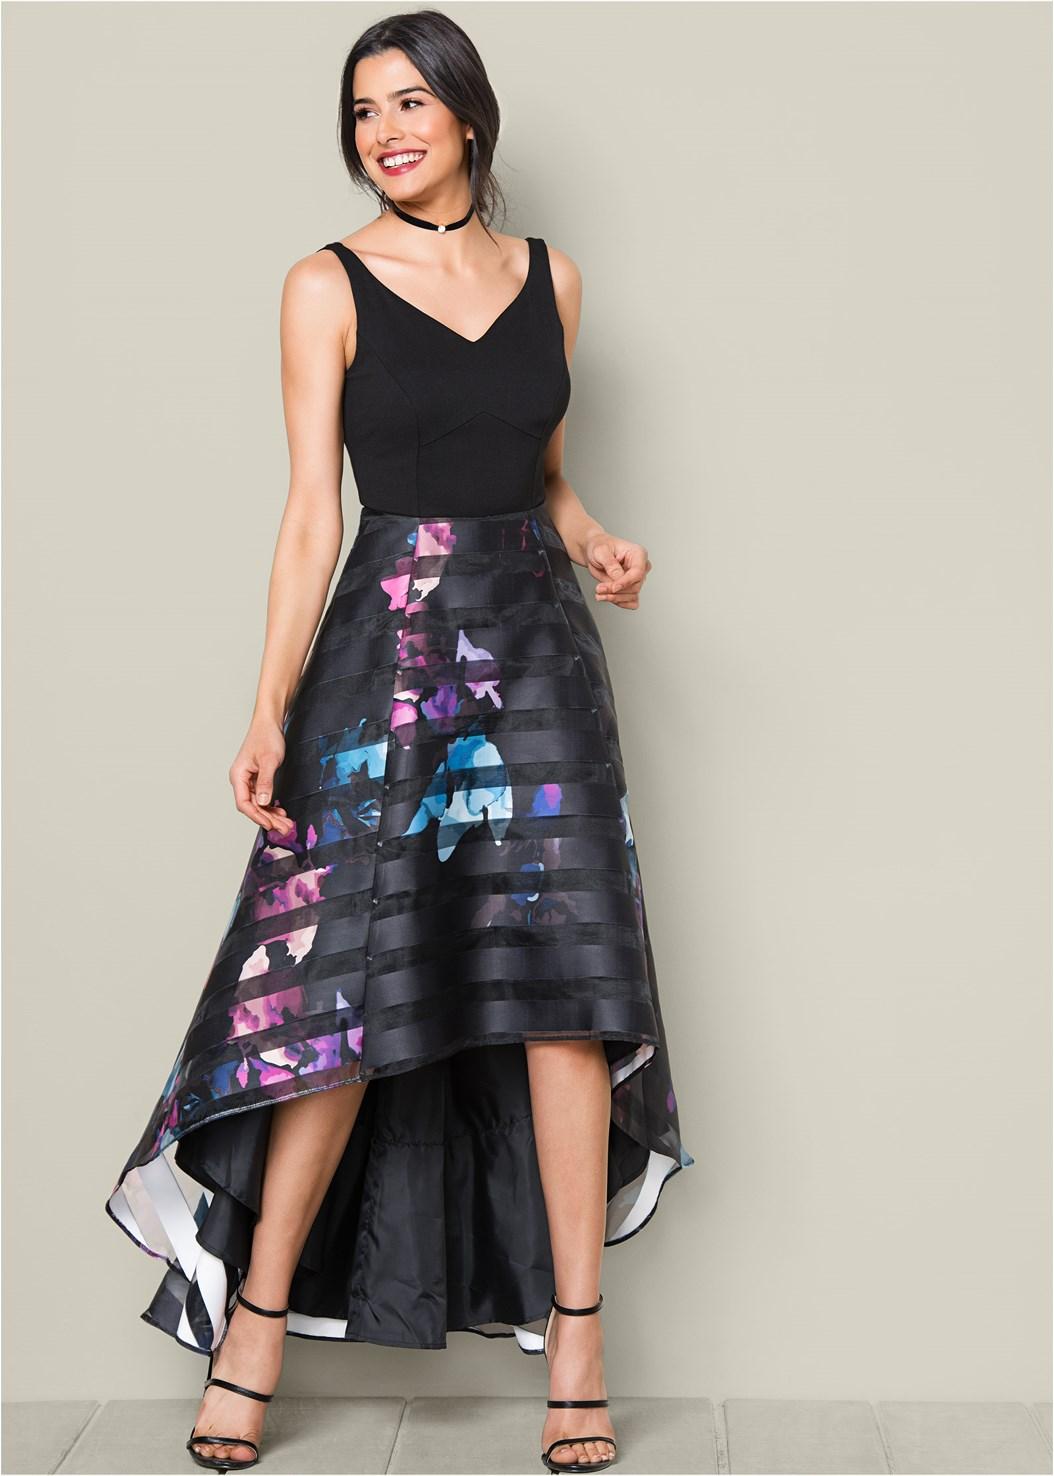 Printed High Low Hem Dress,High Heel Strappy Sandals